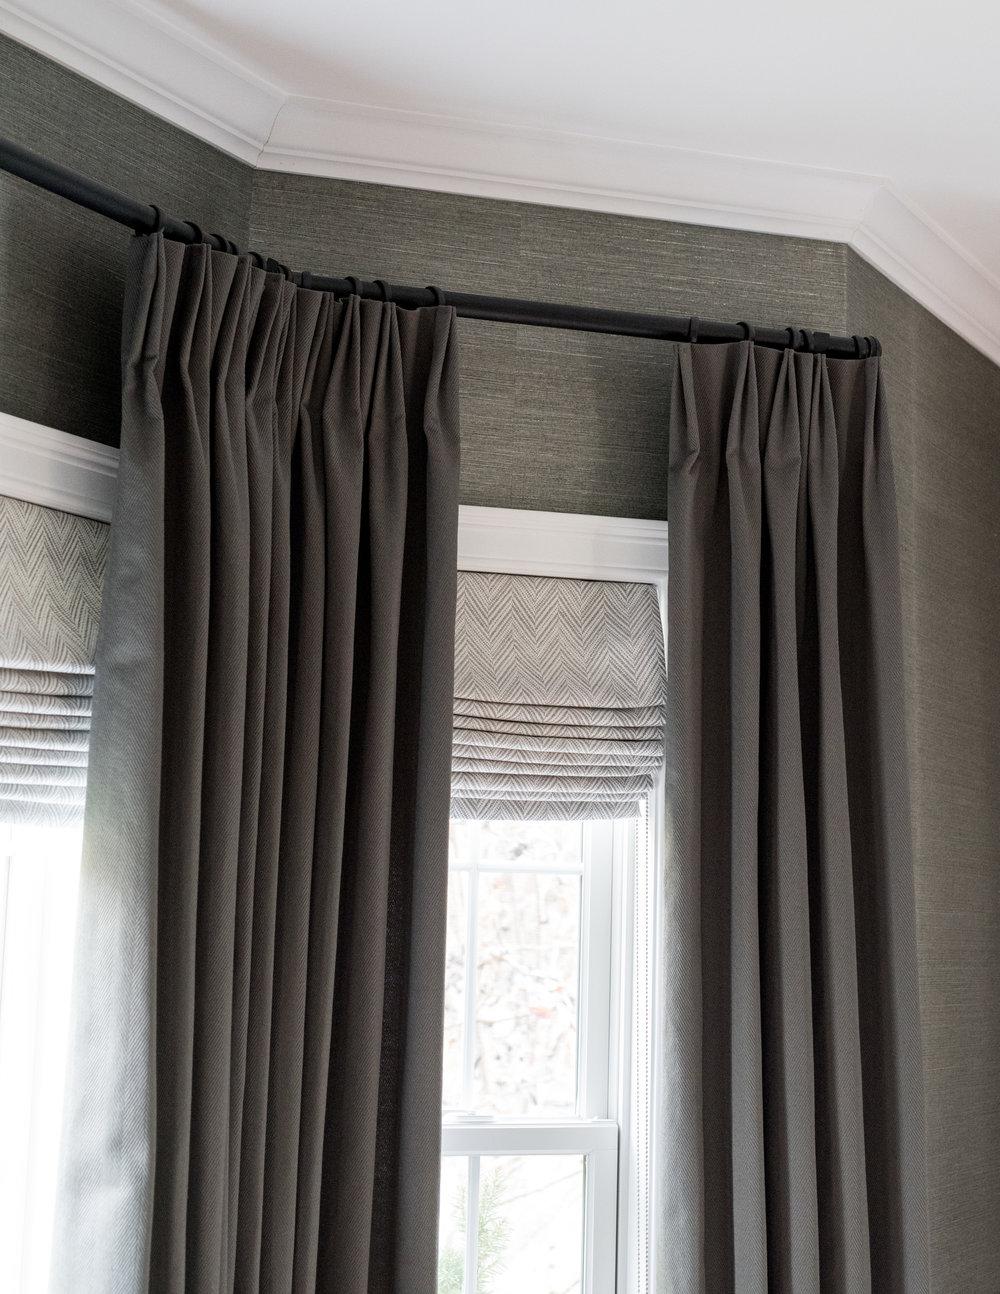 little meadow  gina baran interiors and design Boston luxury designer custom drapery